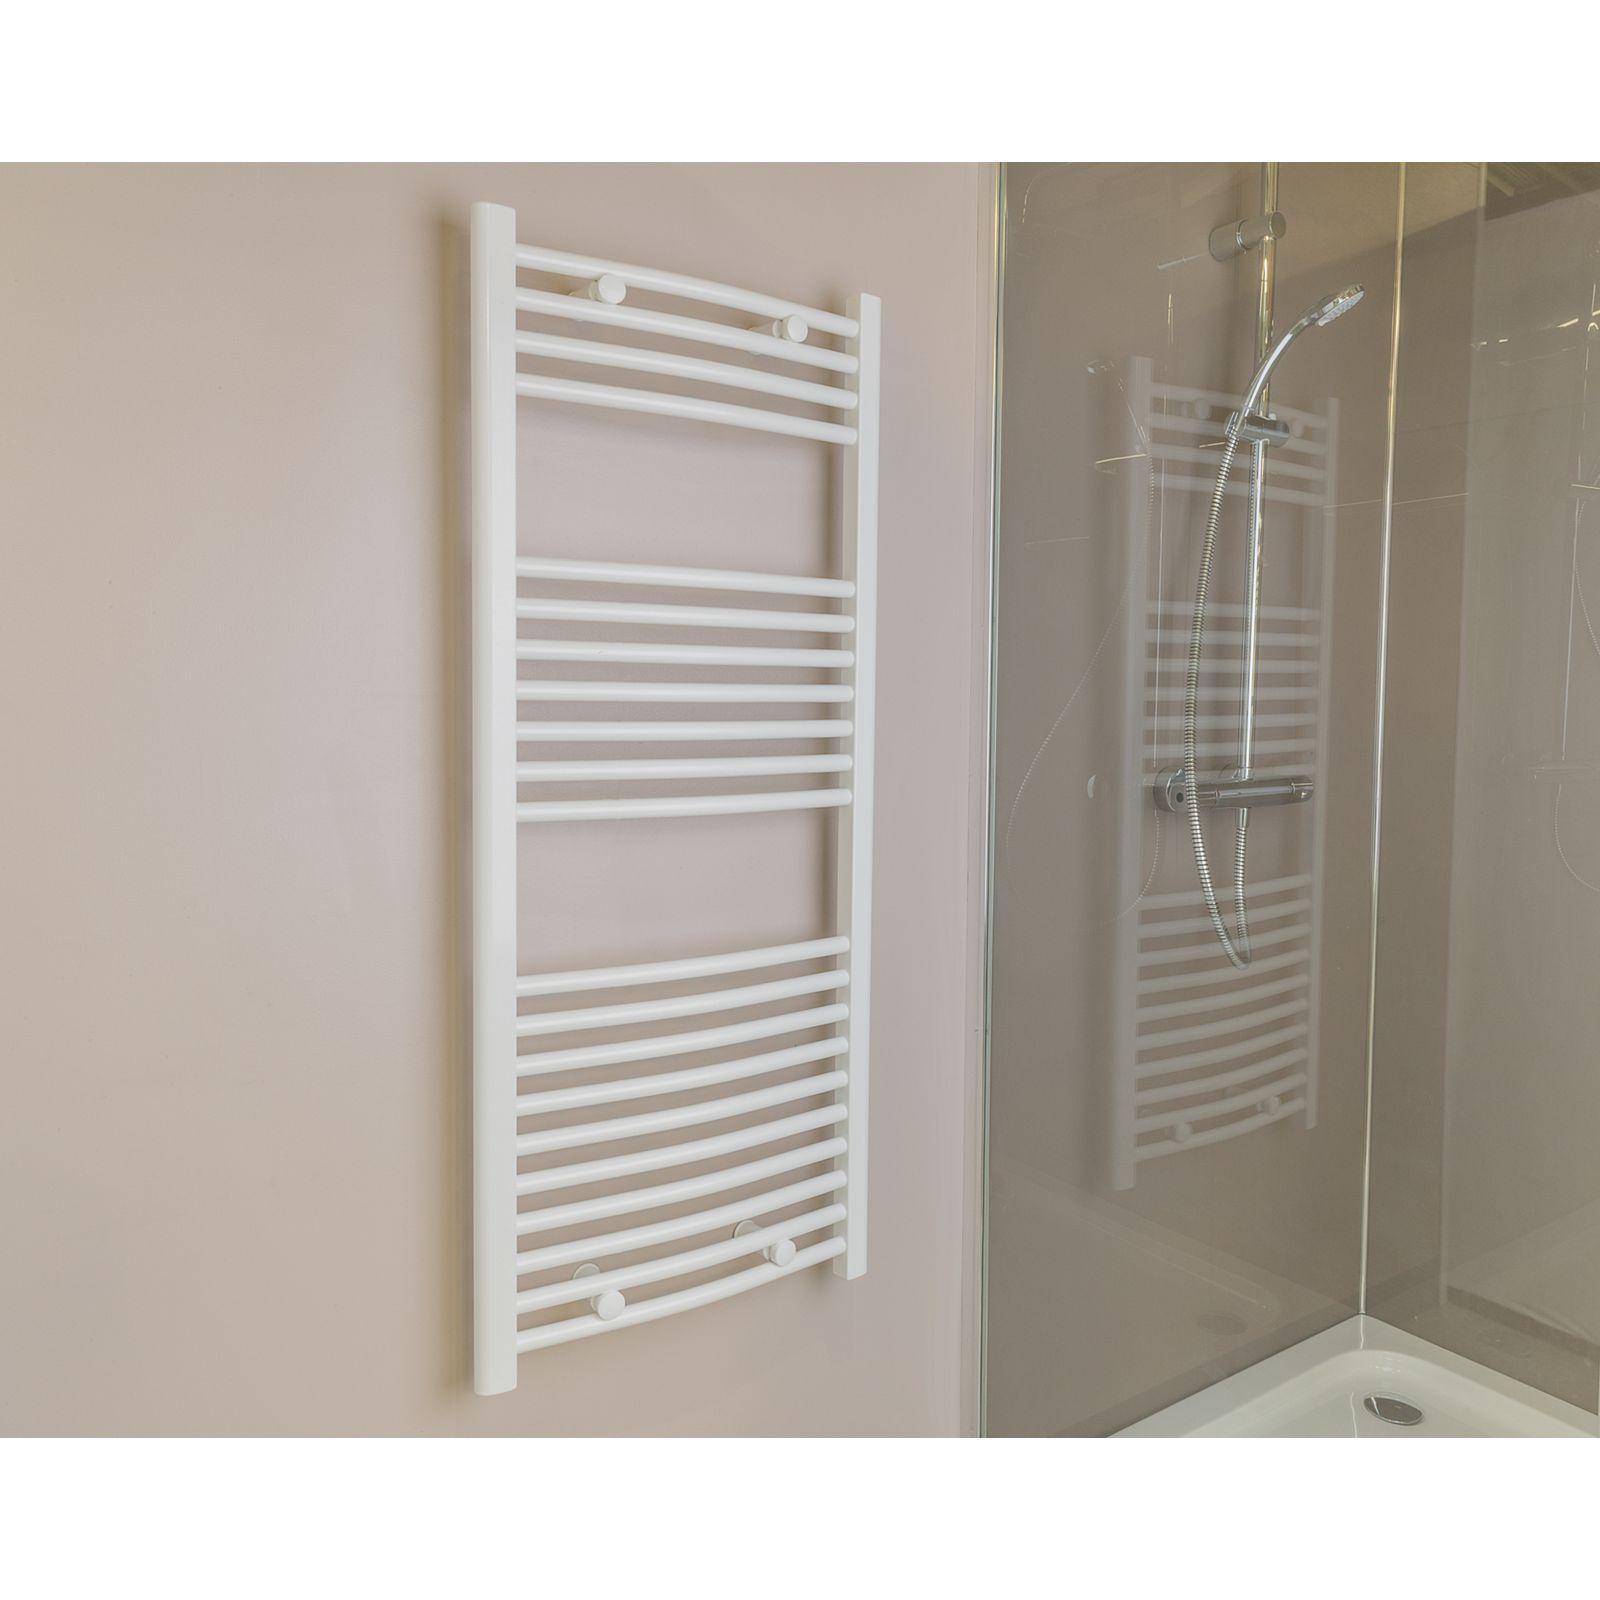 Qual-Rad Heated Towel Rail / Warmer / Radiator – Central Heating 5